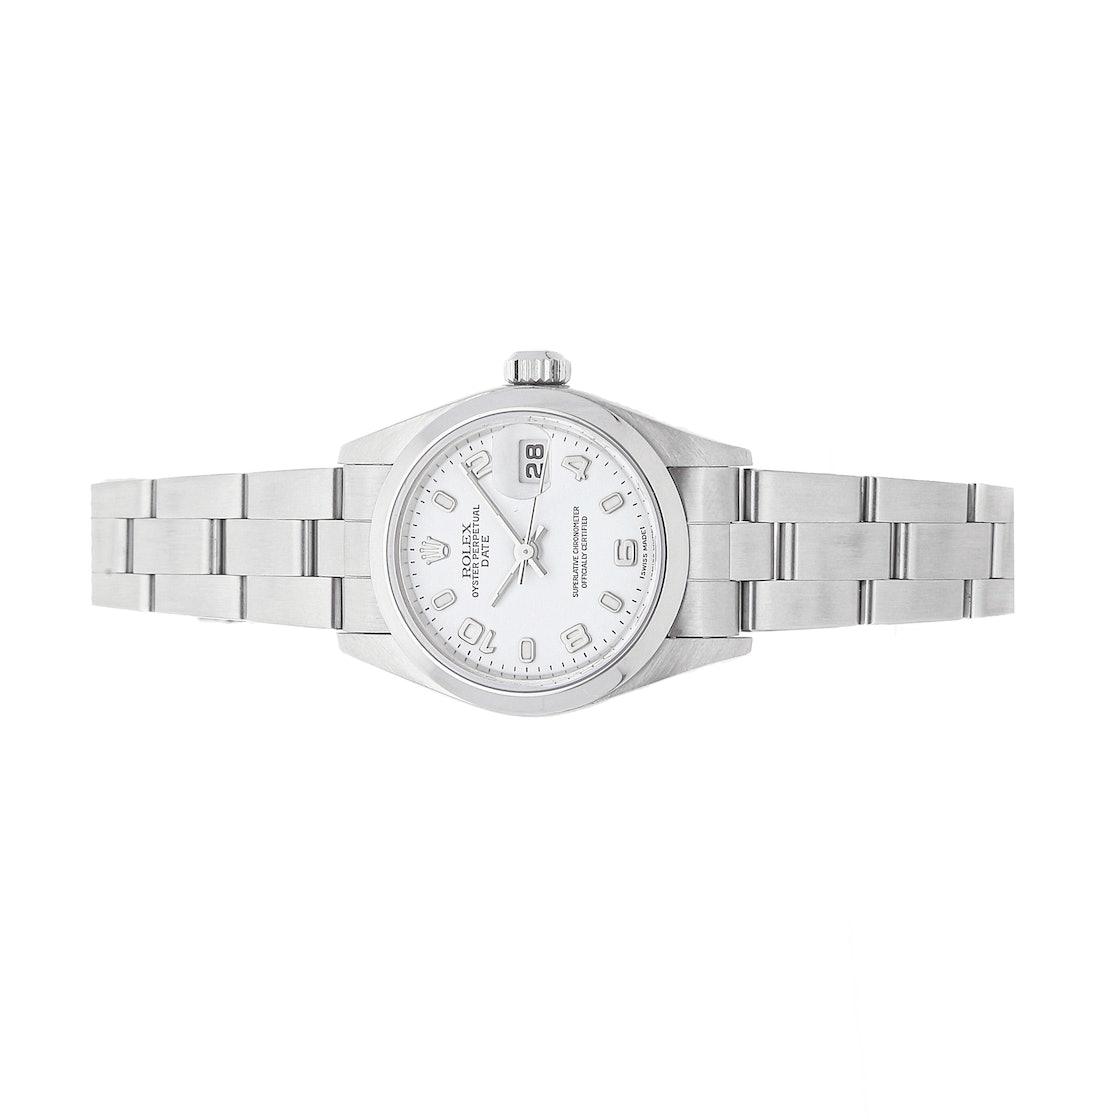 Rolex Oyster Perpetual Date 79160